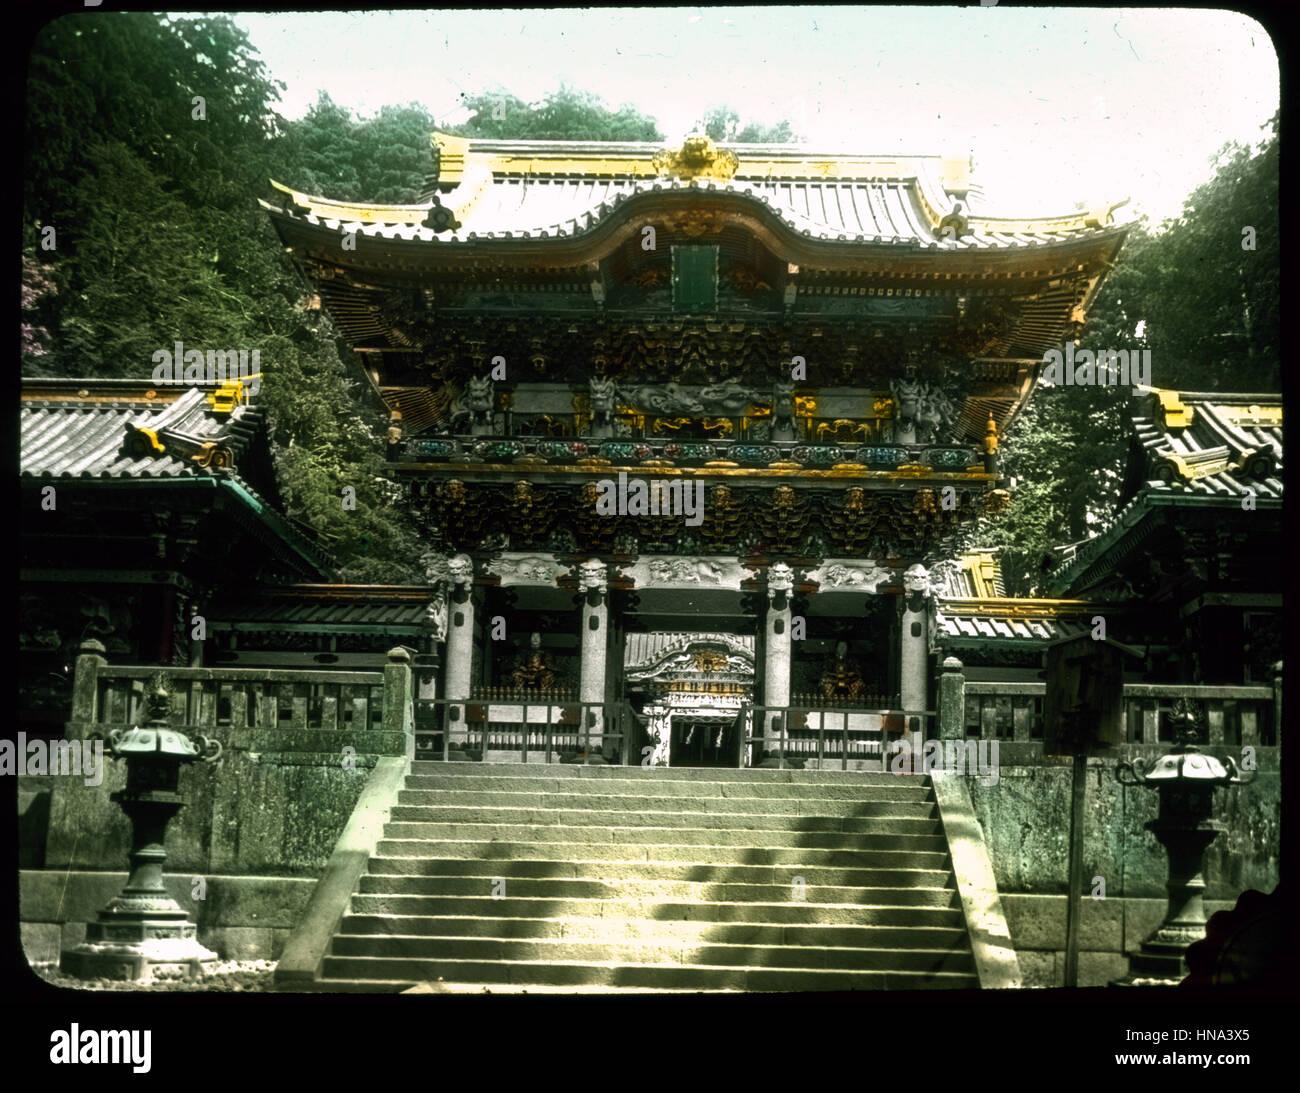 Herbert Geddes, Leben in Japan, ca. 1910 - Nahaufnahme des ornamentalen Gebäude mit Gold verziert Stockbild